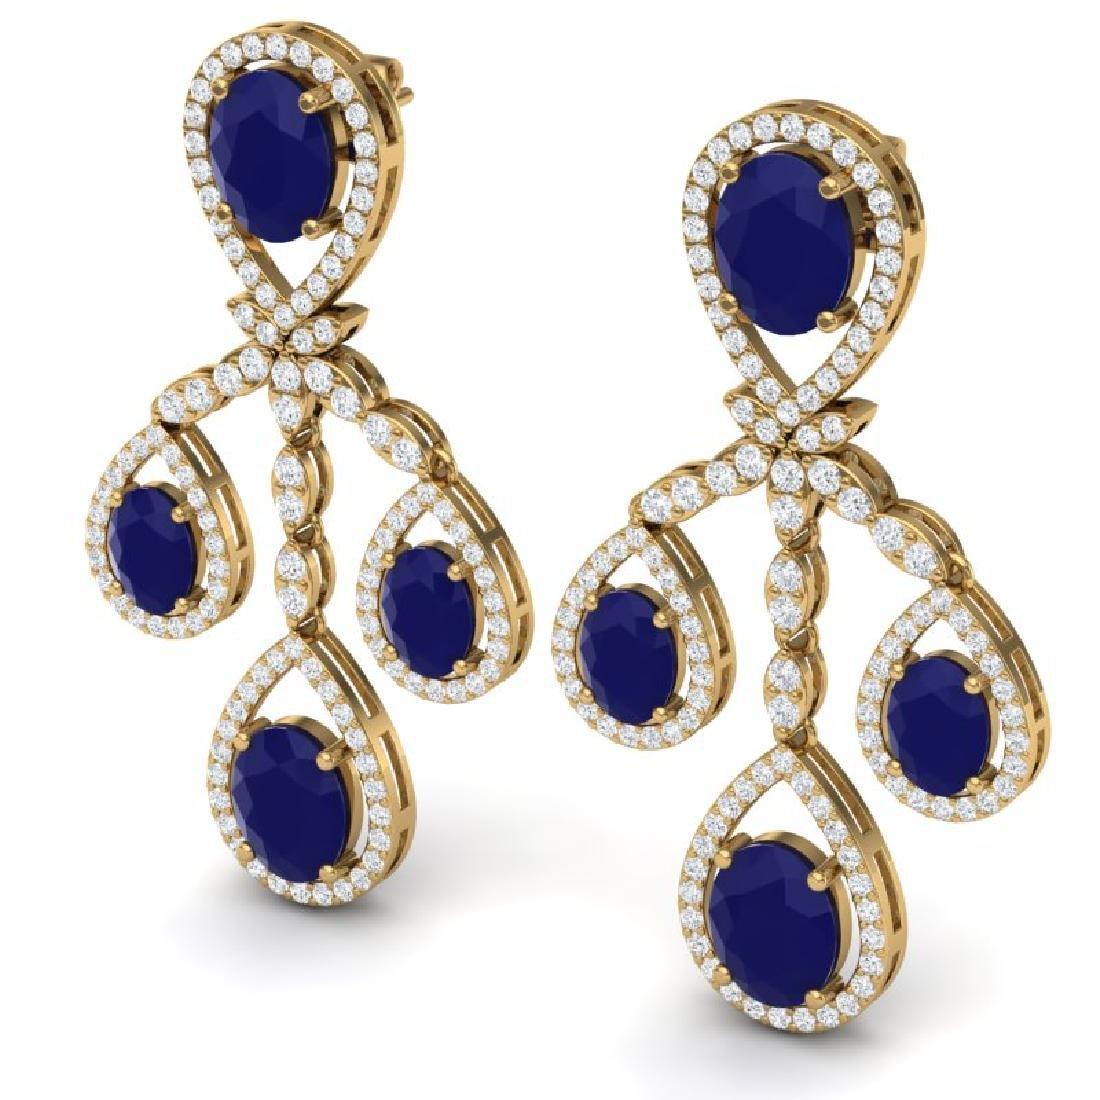 25.08 CTW Royalty Sapphire & VS Diamond Earrings 18K - 2